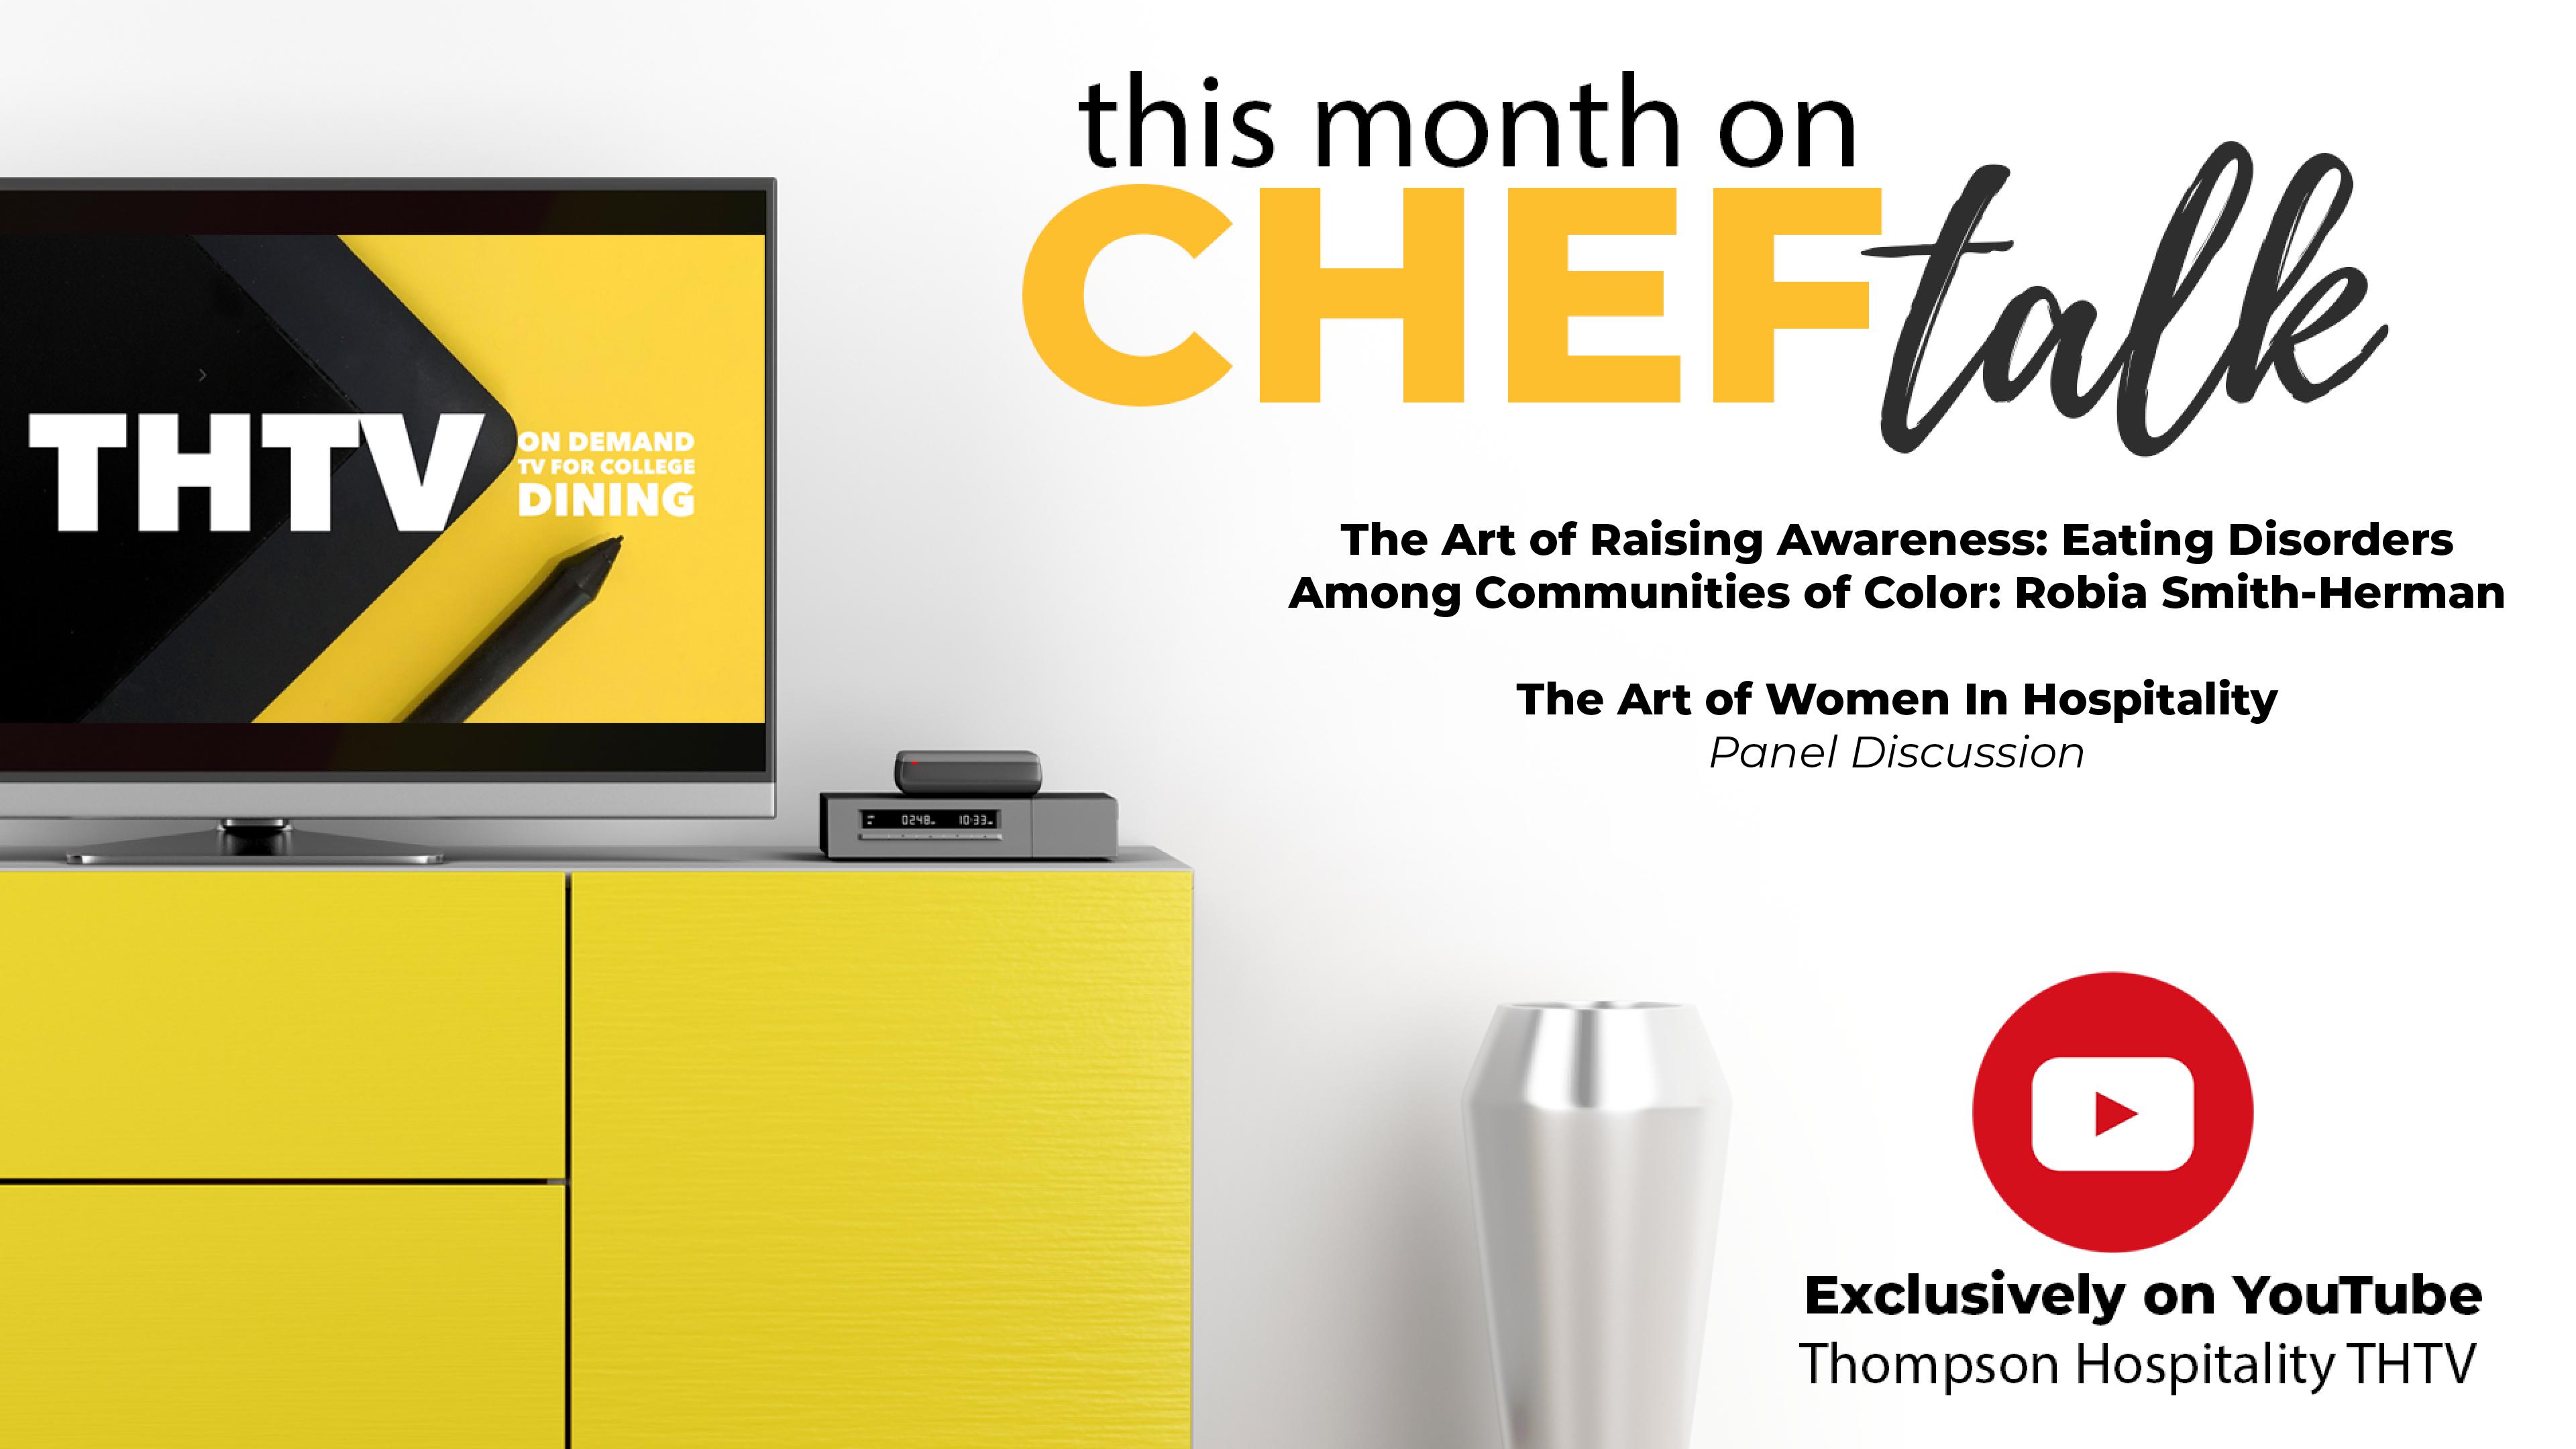 chef-talk_robia Smith-Hermen